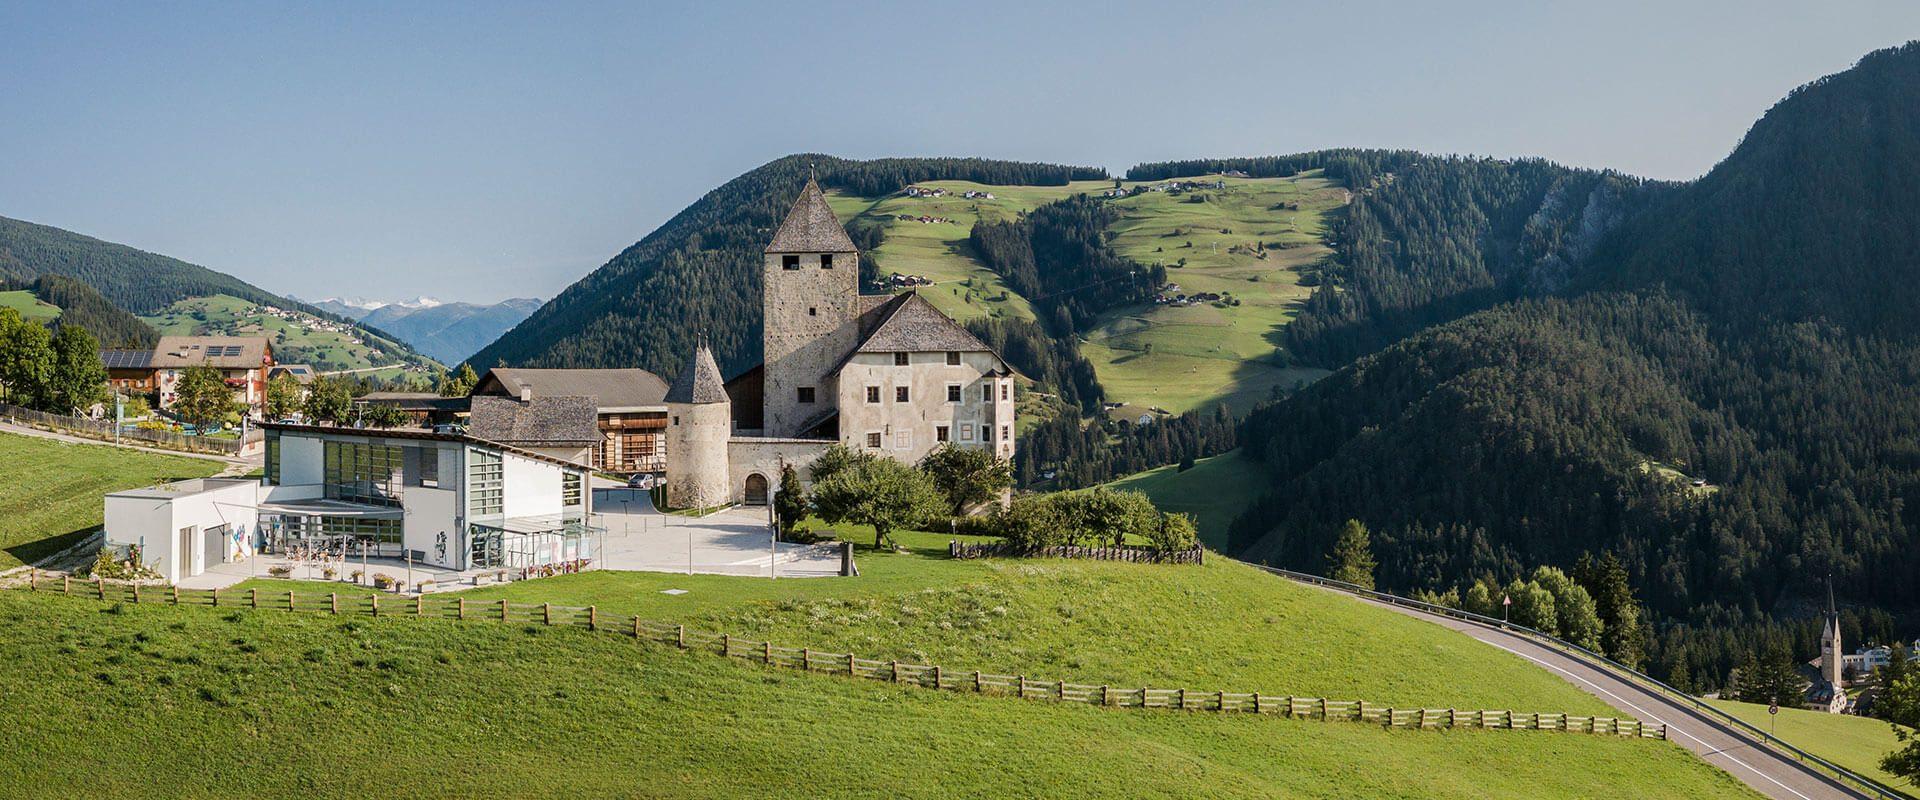 Aktivurlaub Eggental | Urlaub auf dem Ebenhof in Südtirol